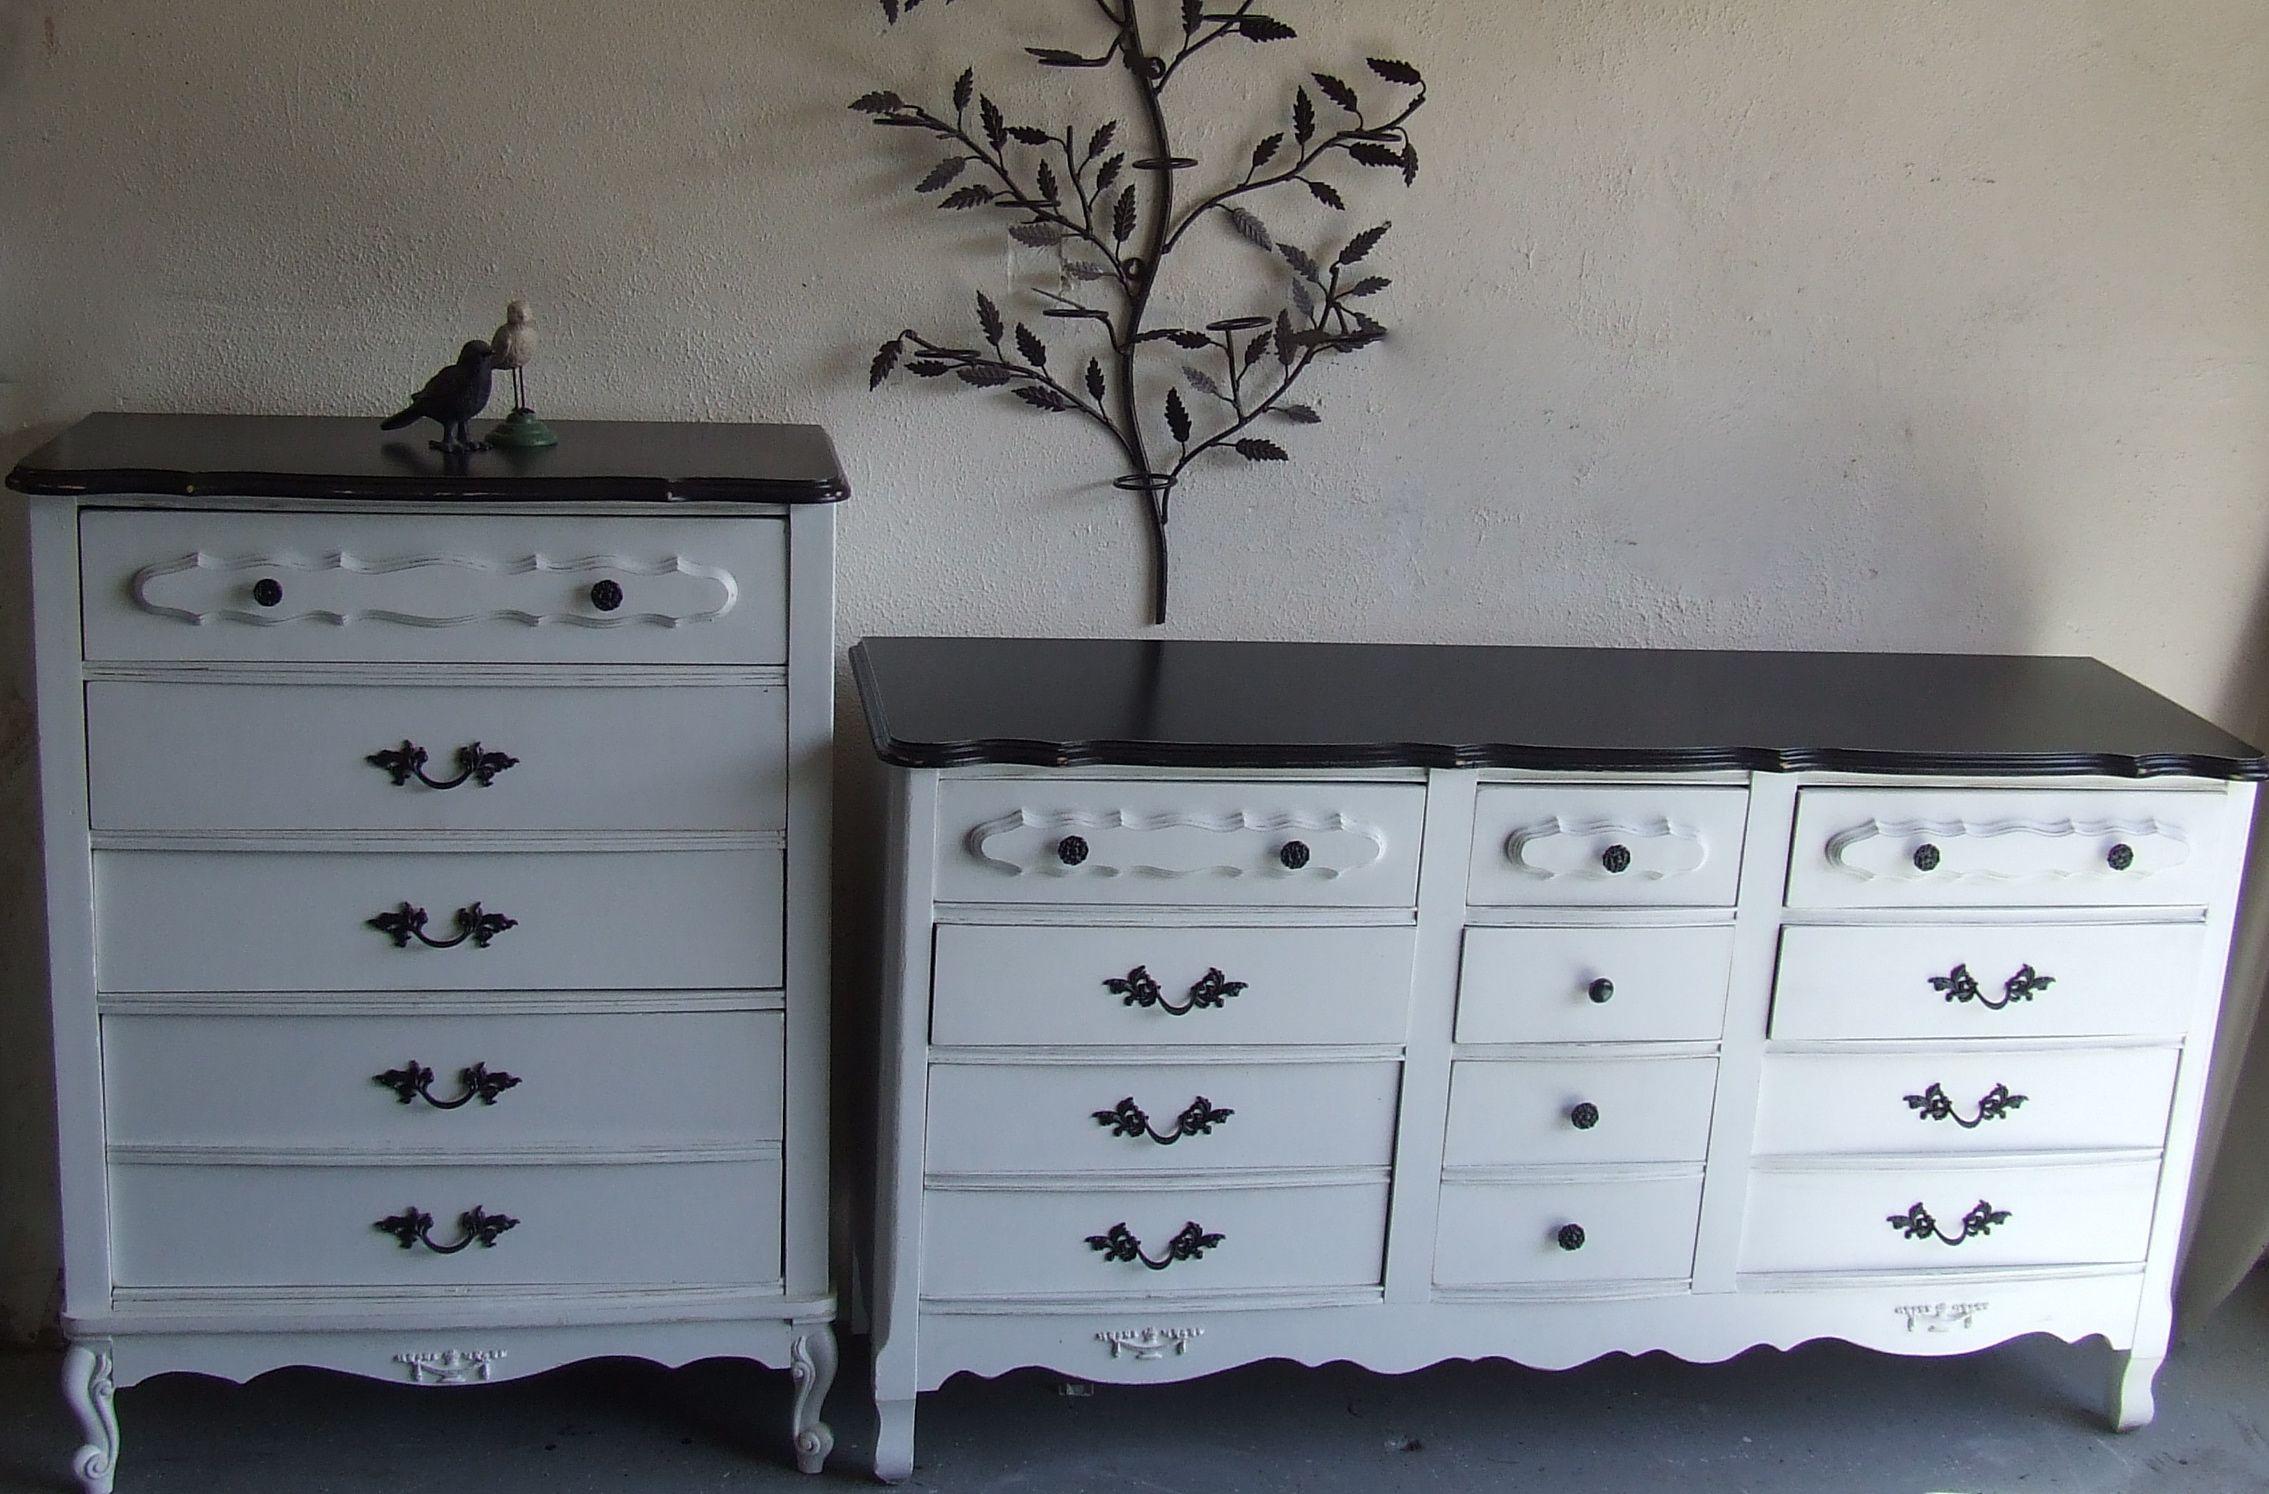 cute white black cottage french provincial dresser reborn from ugly faded vintage gold. Black Bedroom Furniture Sets. Home Design Ideas